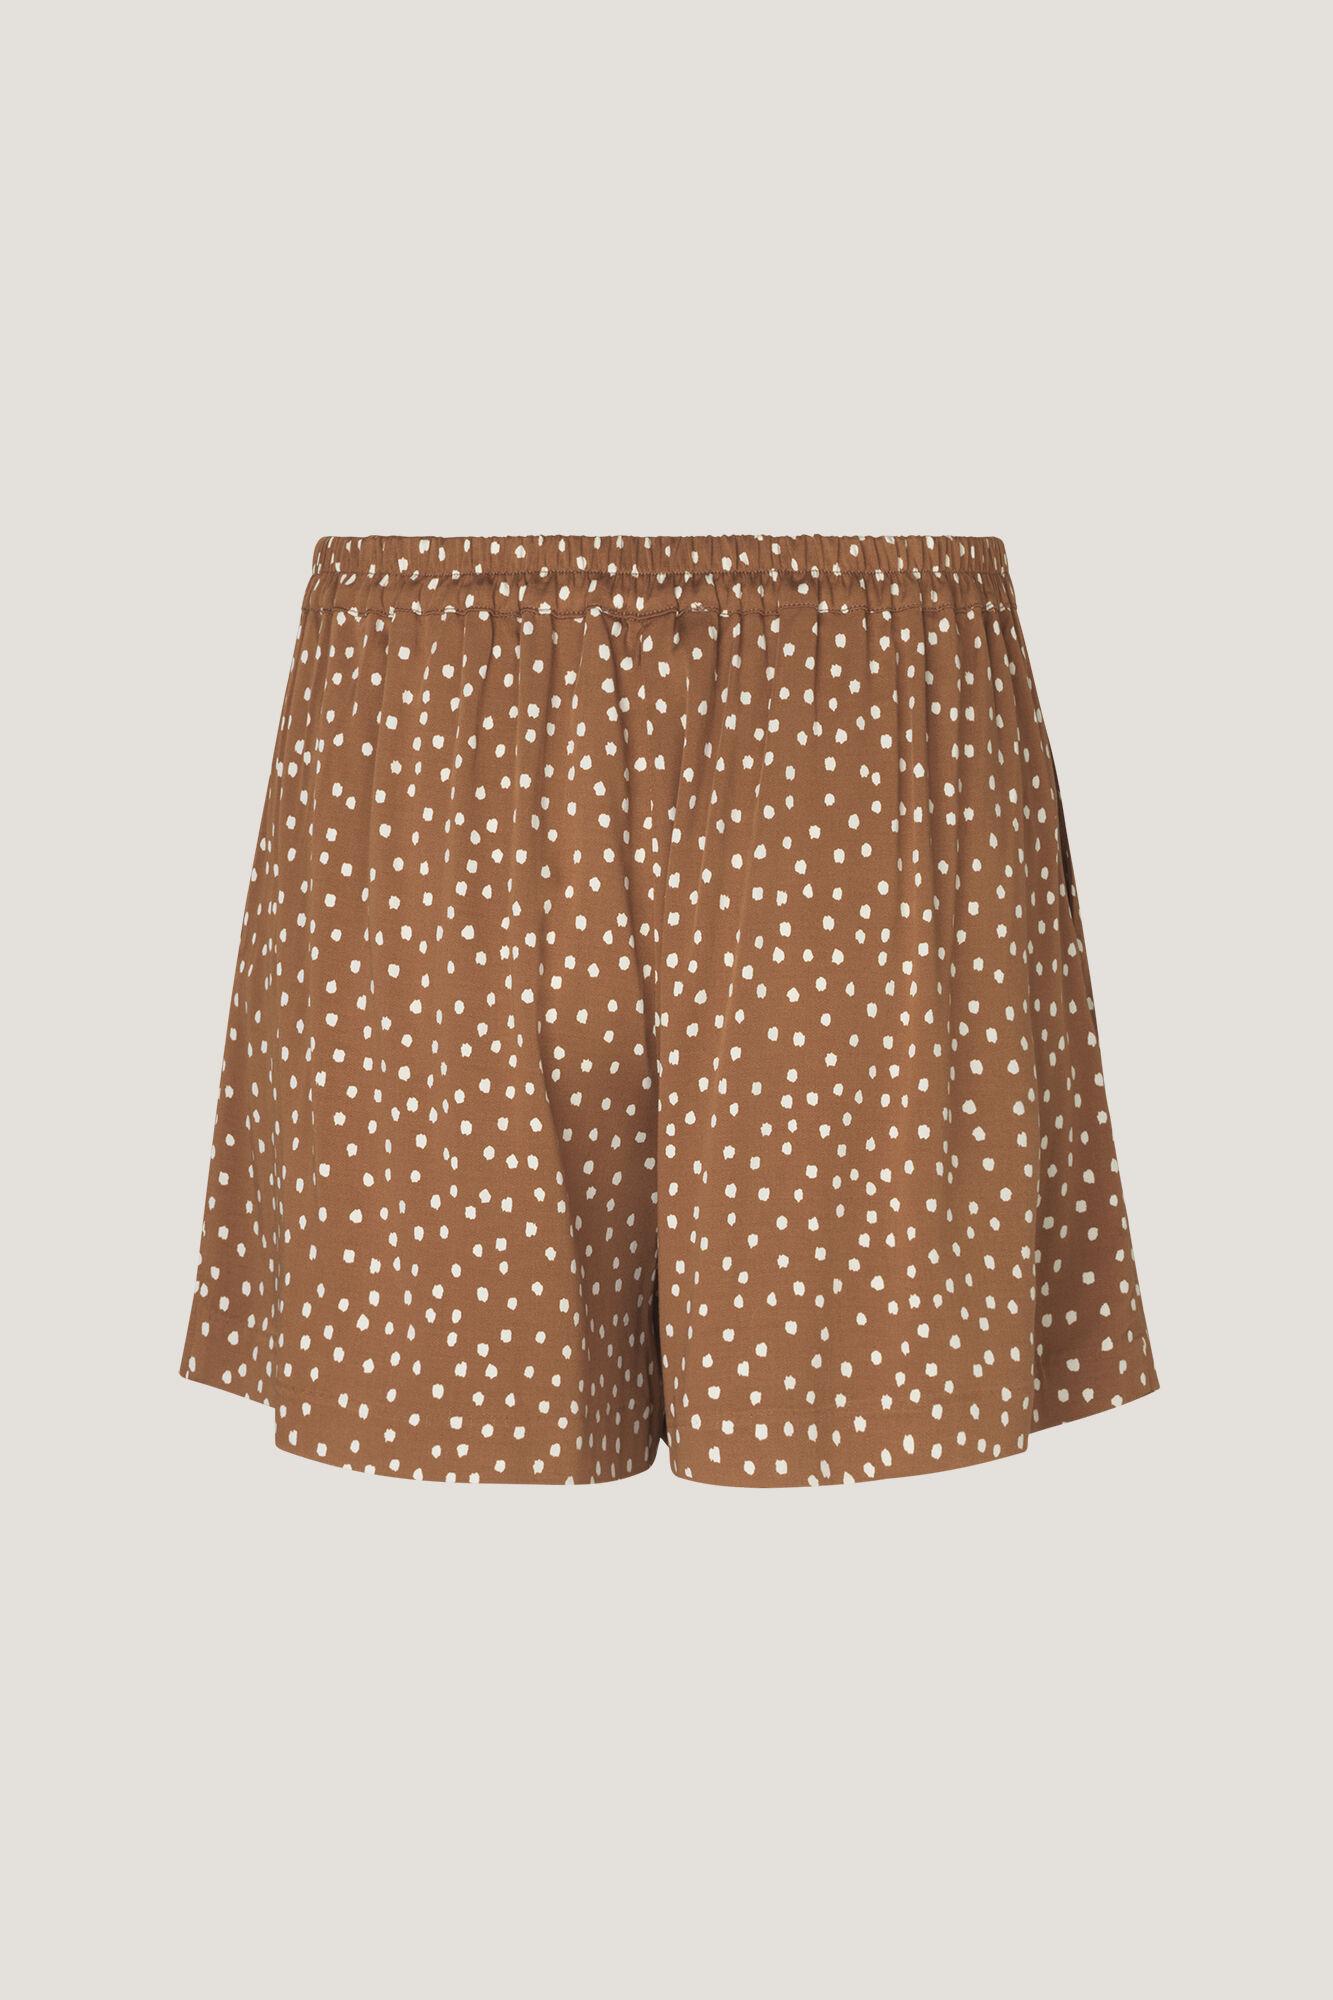 Ganda shorts aop 10876